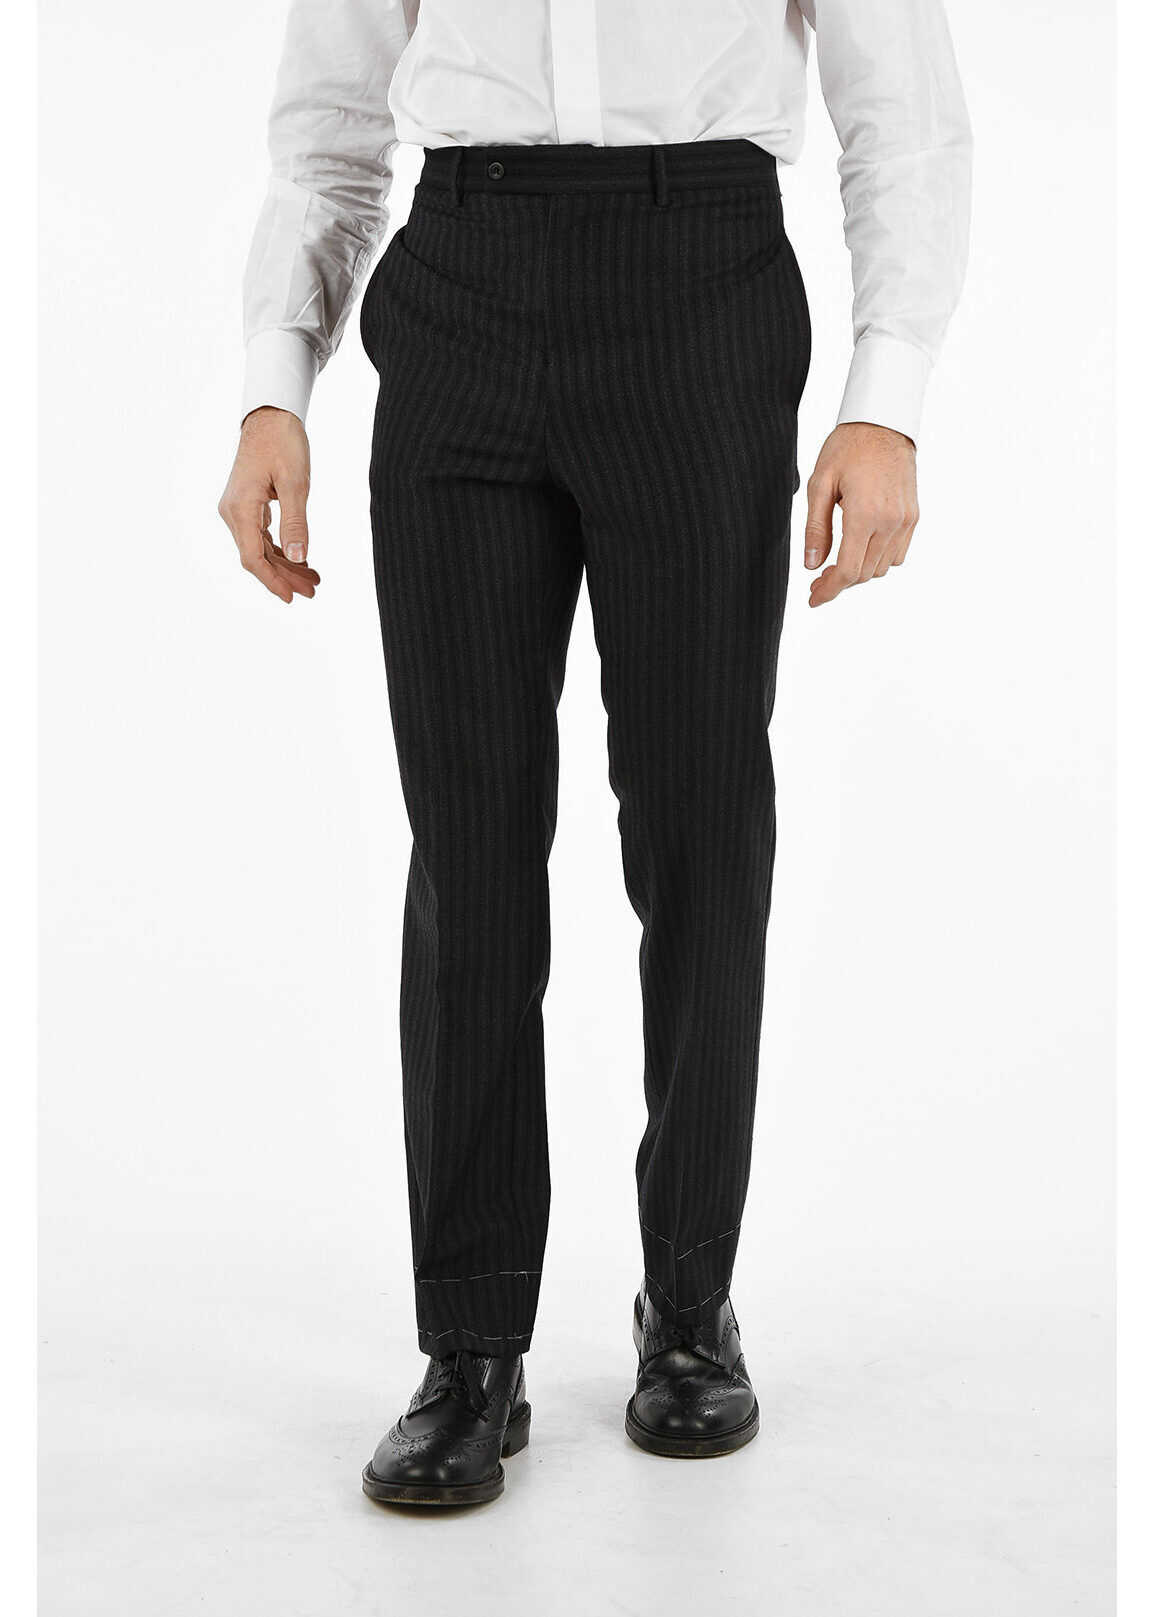 pencil striped Mid-rise waist no hem pants thumbnail